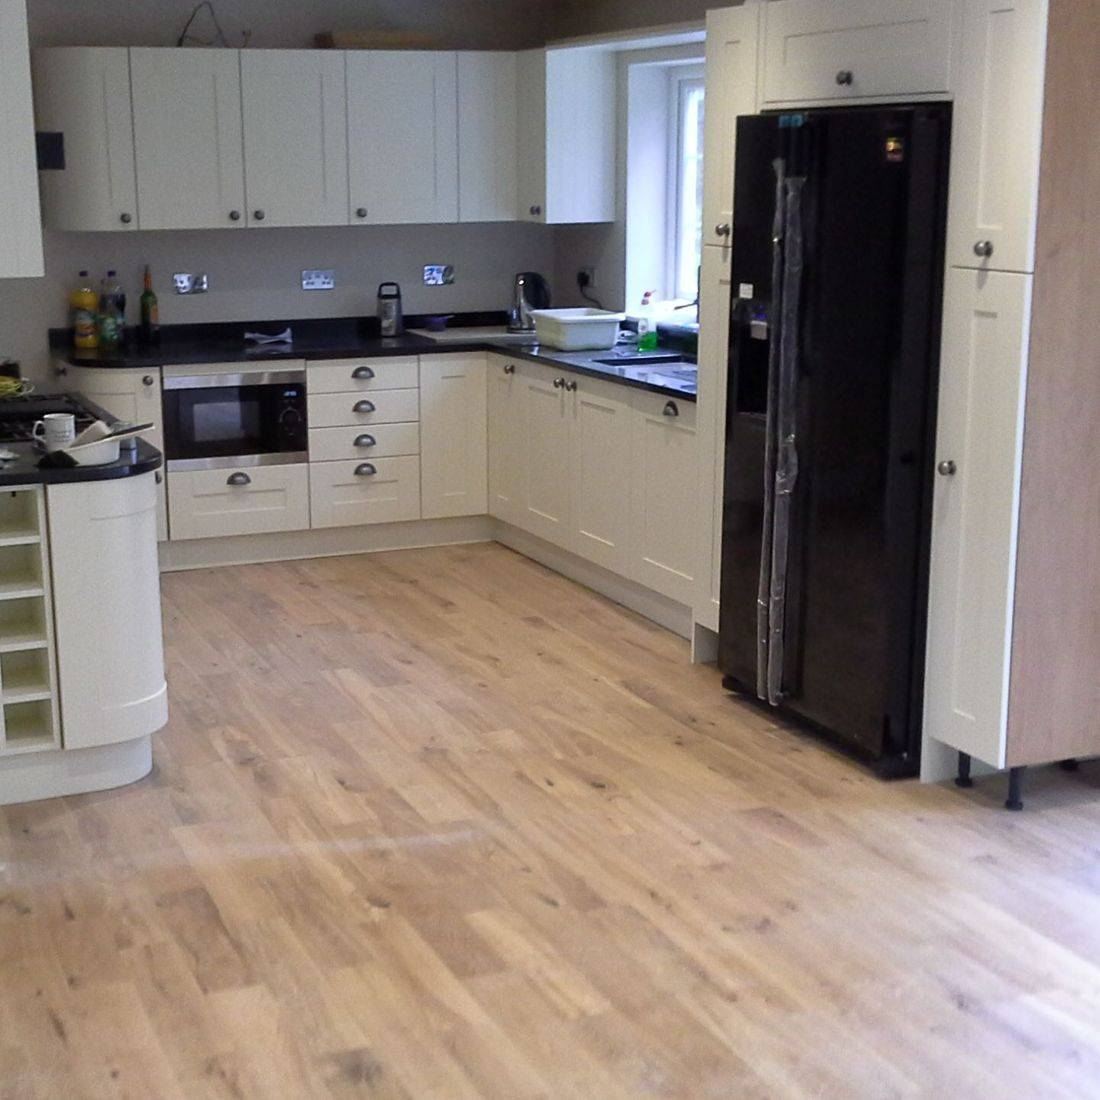 Kitchen fitters in Berkshire